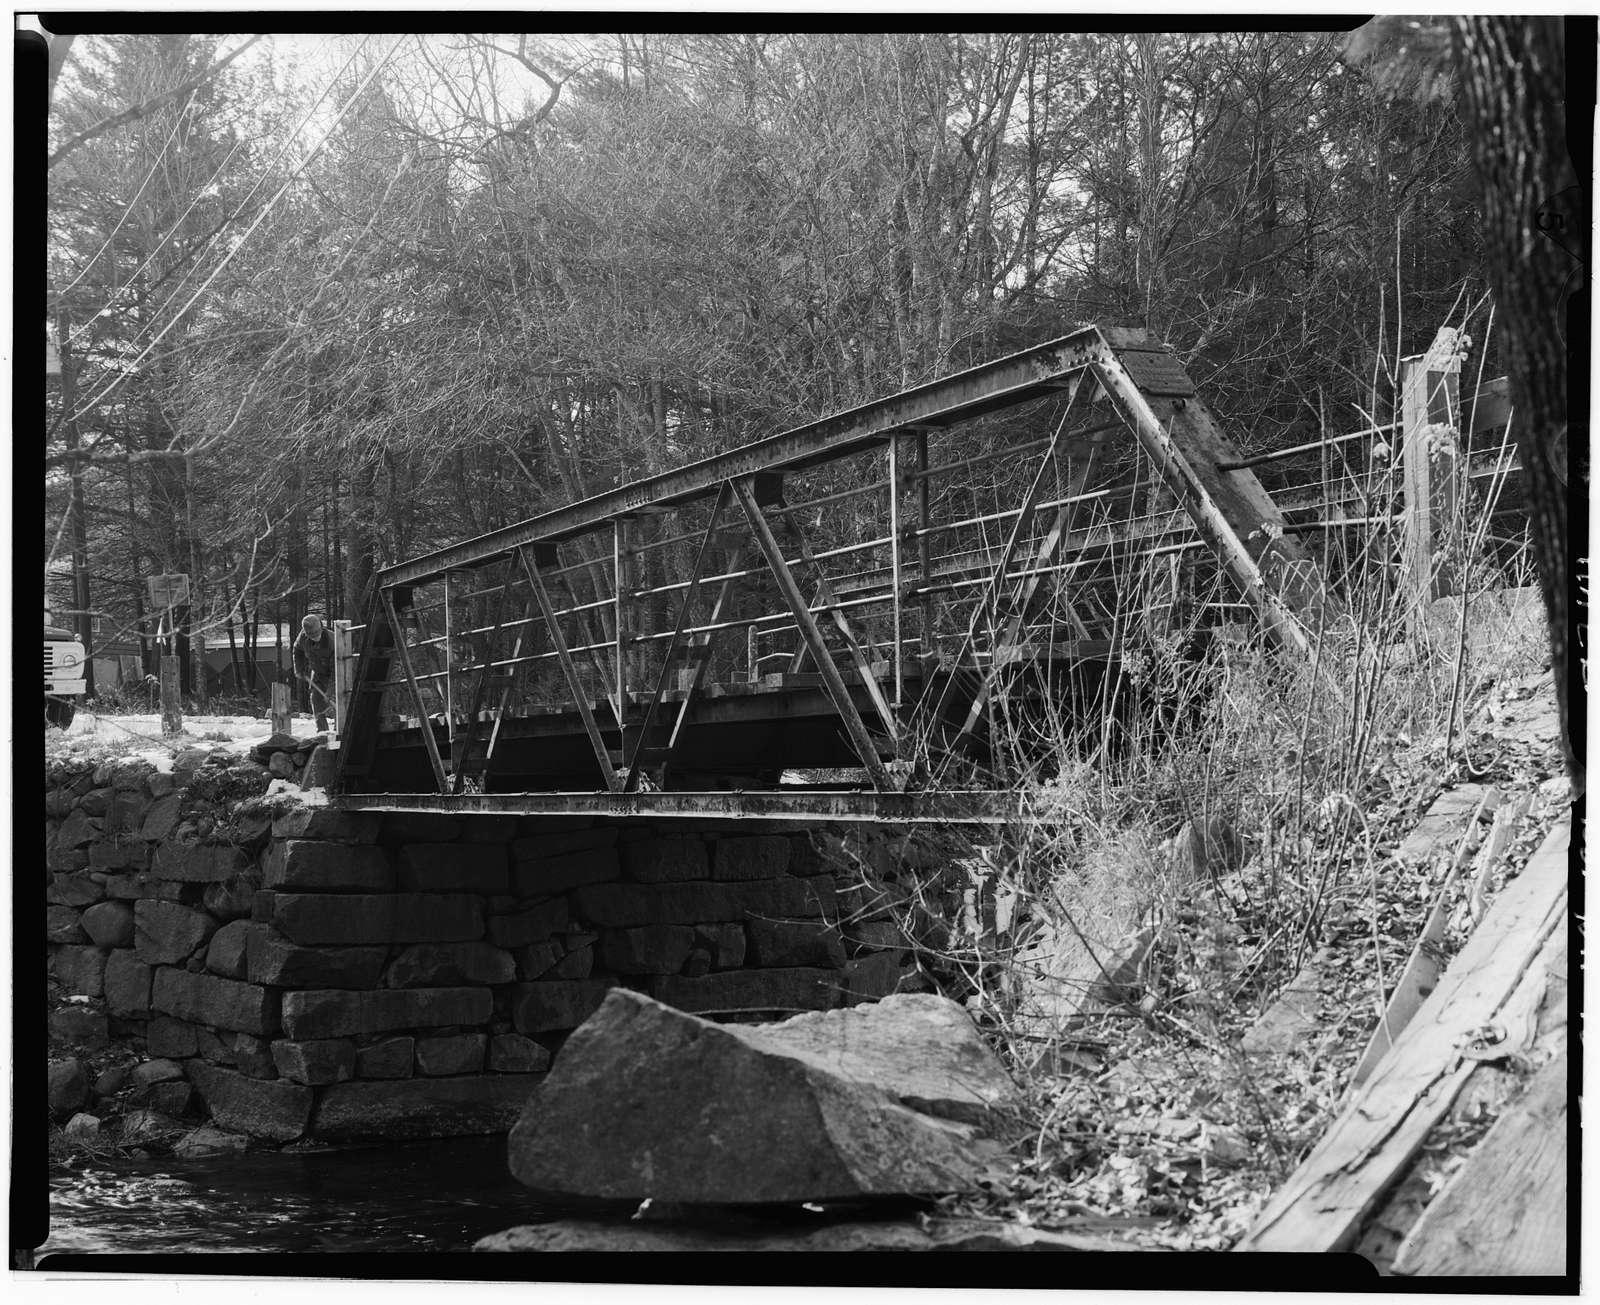 Osgood Bridge, Spanning Beebe River, Perch Pond Road, Campton Station, Grafton County, NH